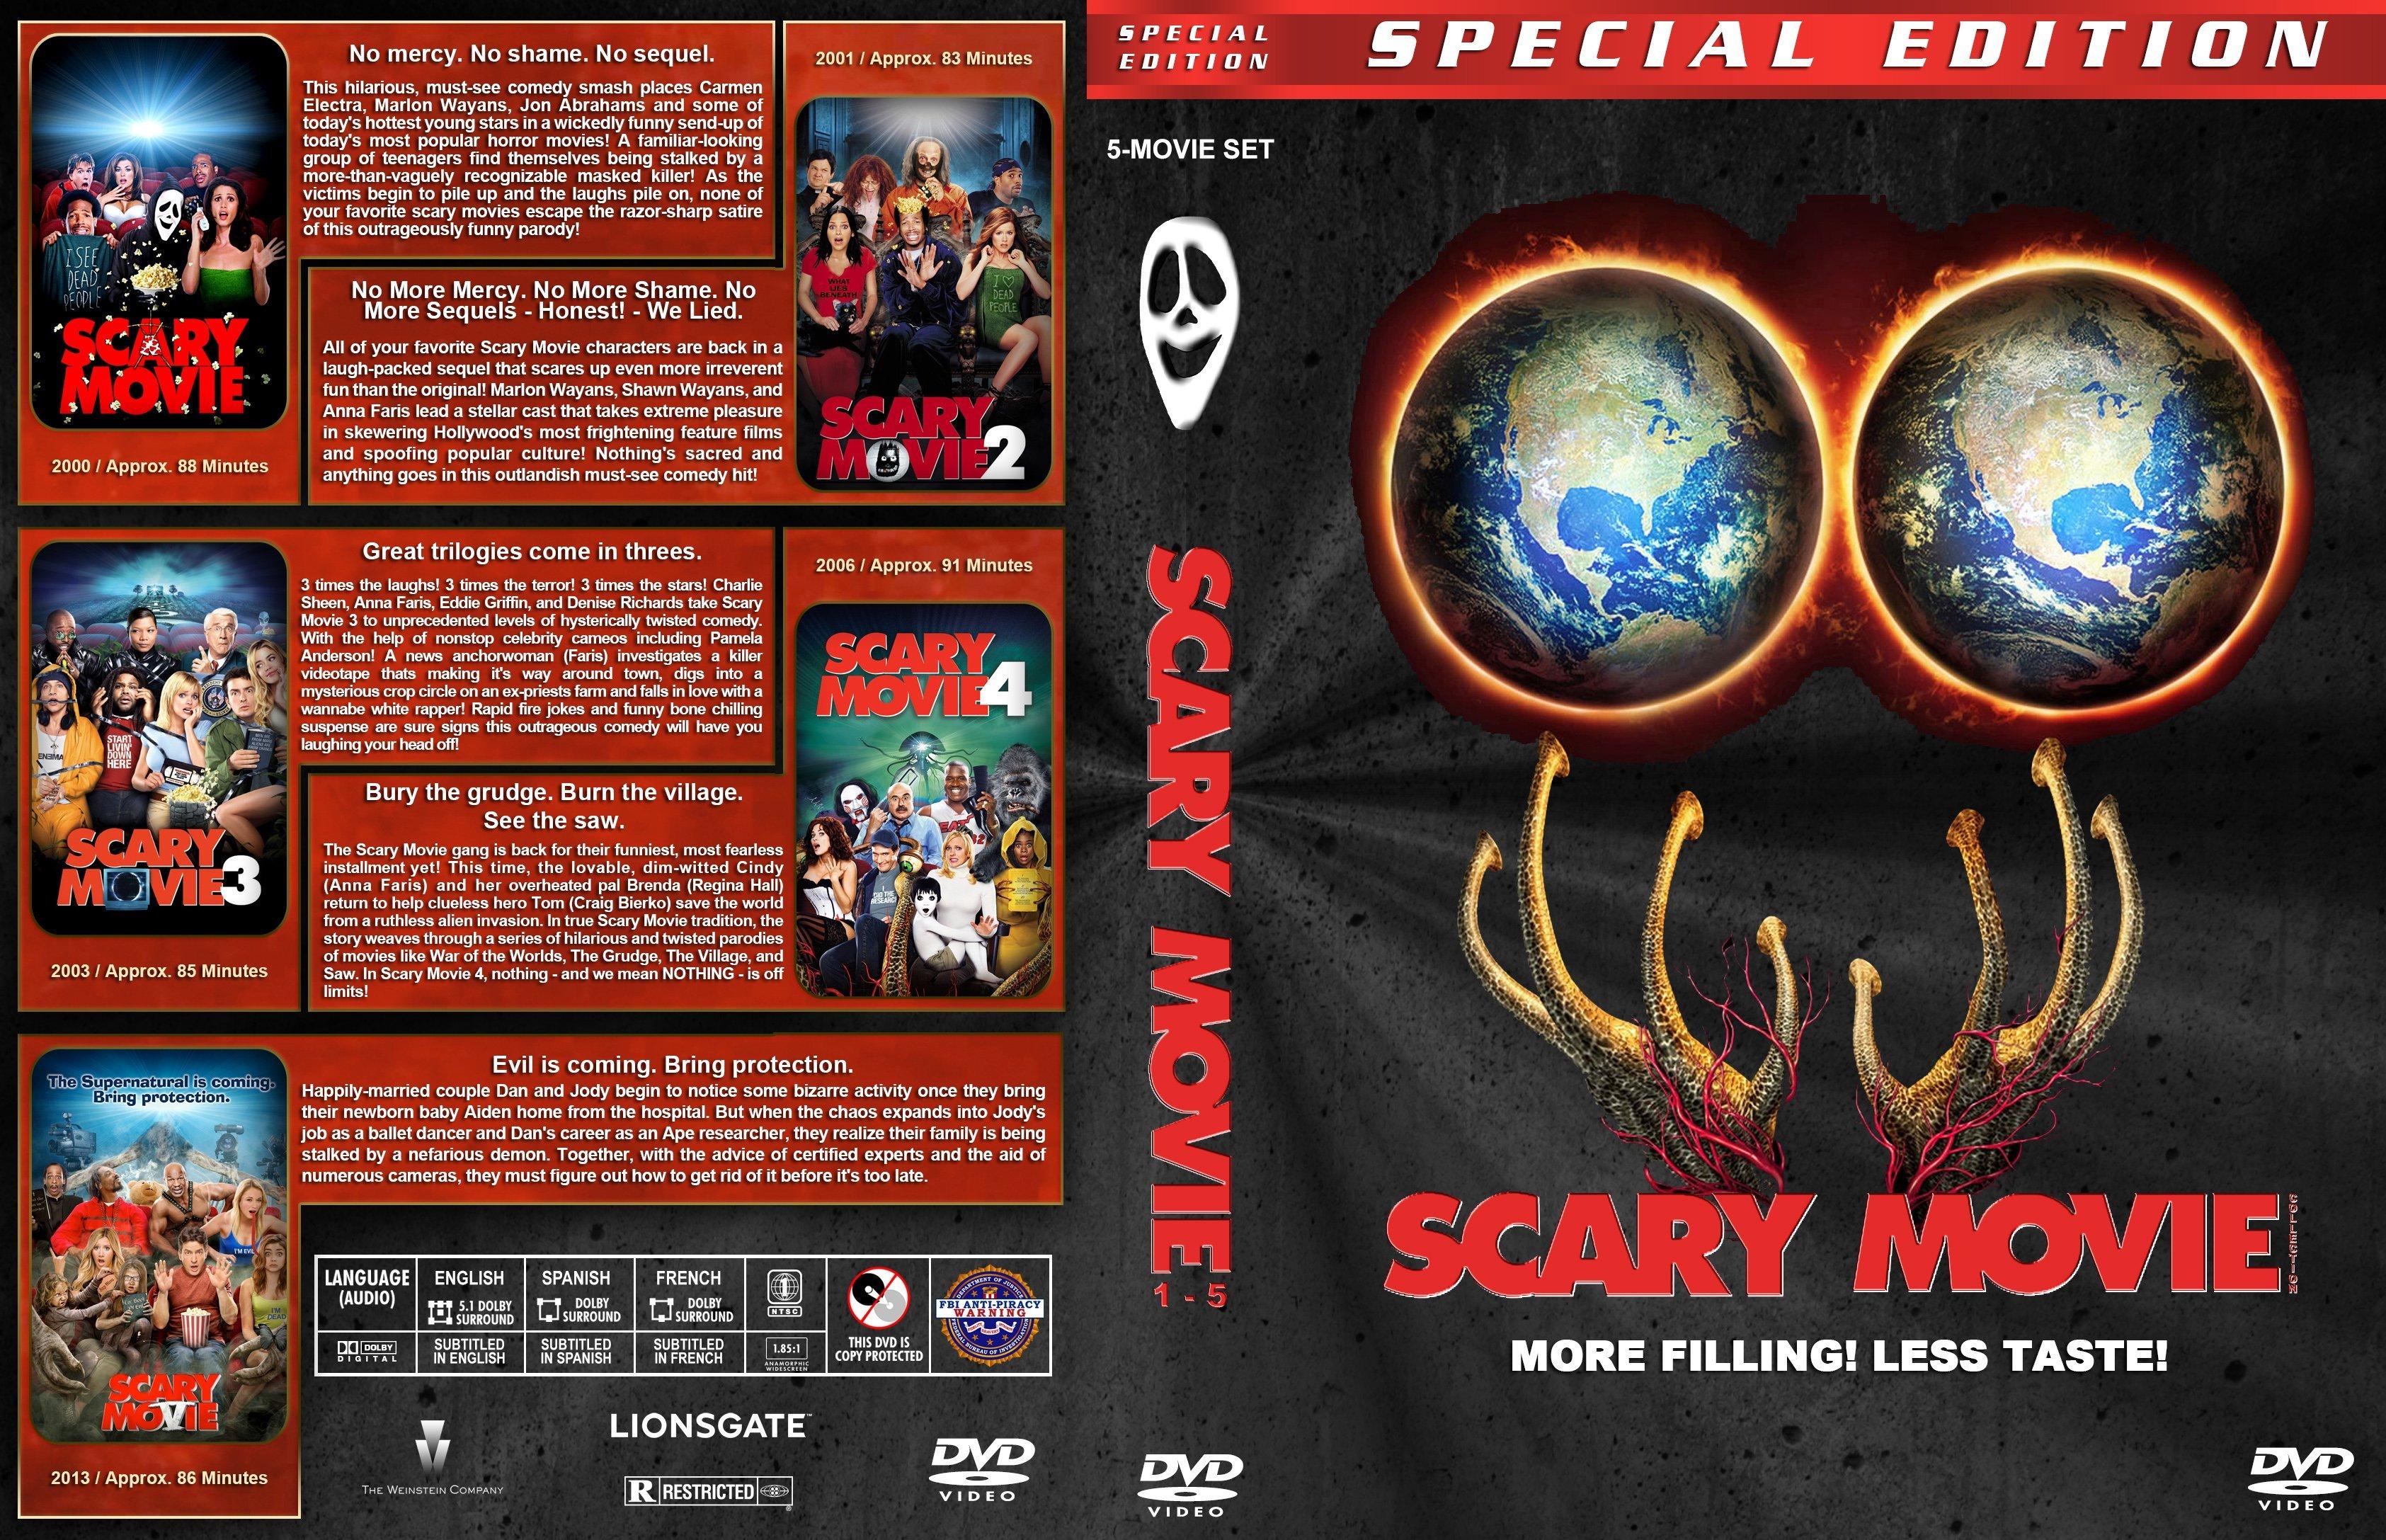 Scary movie 3 song and lyrics